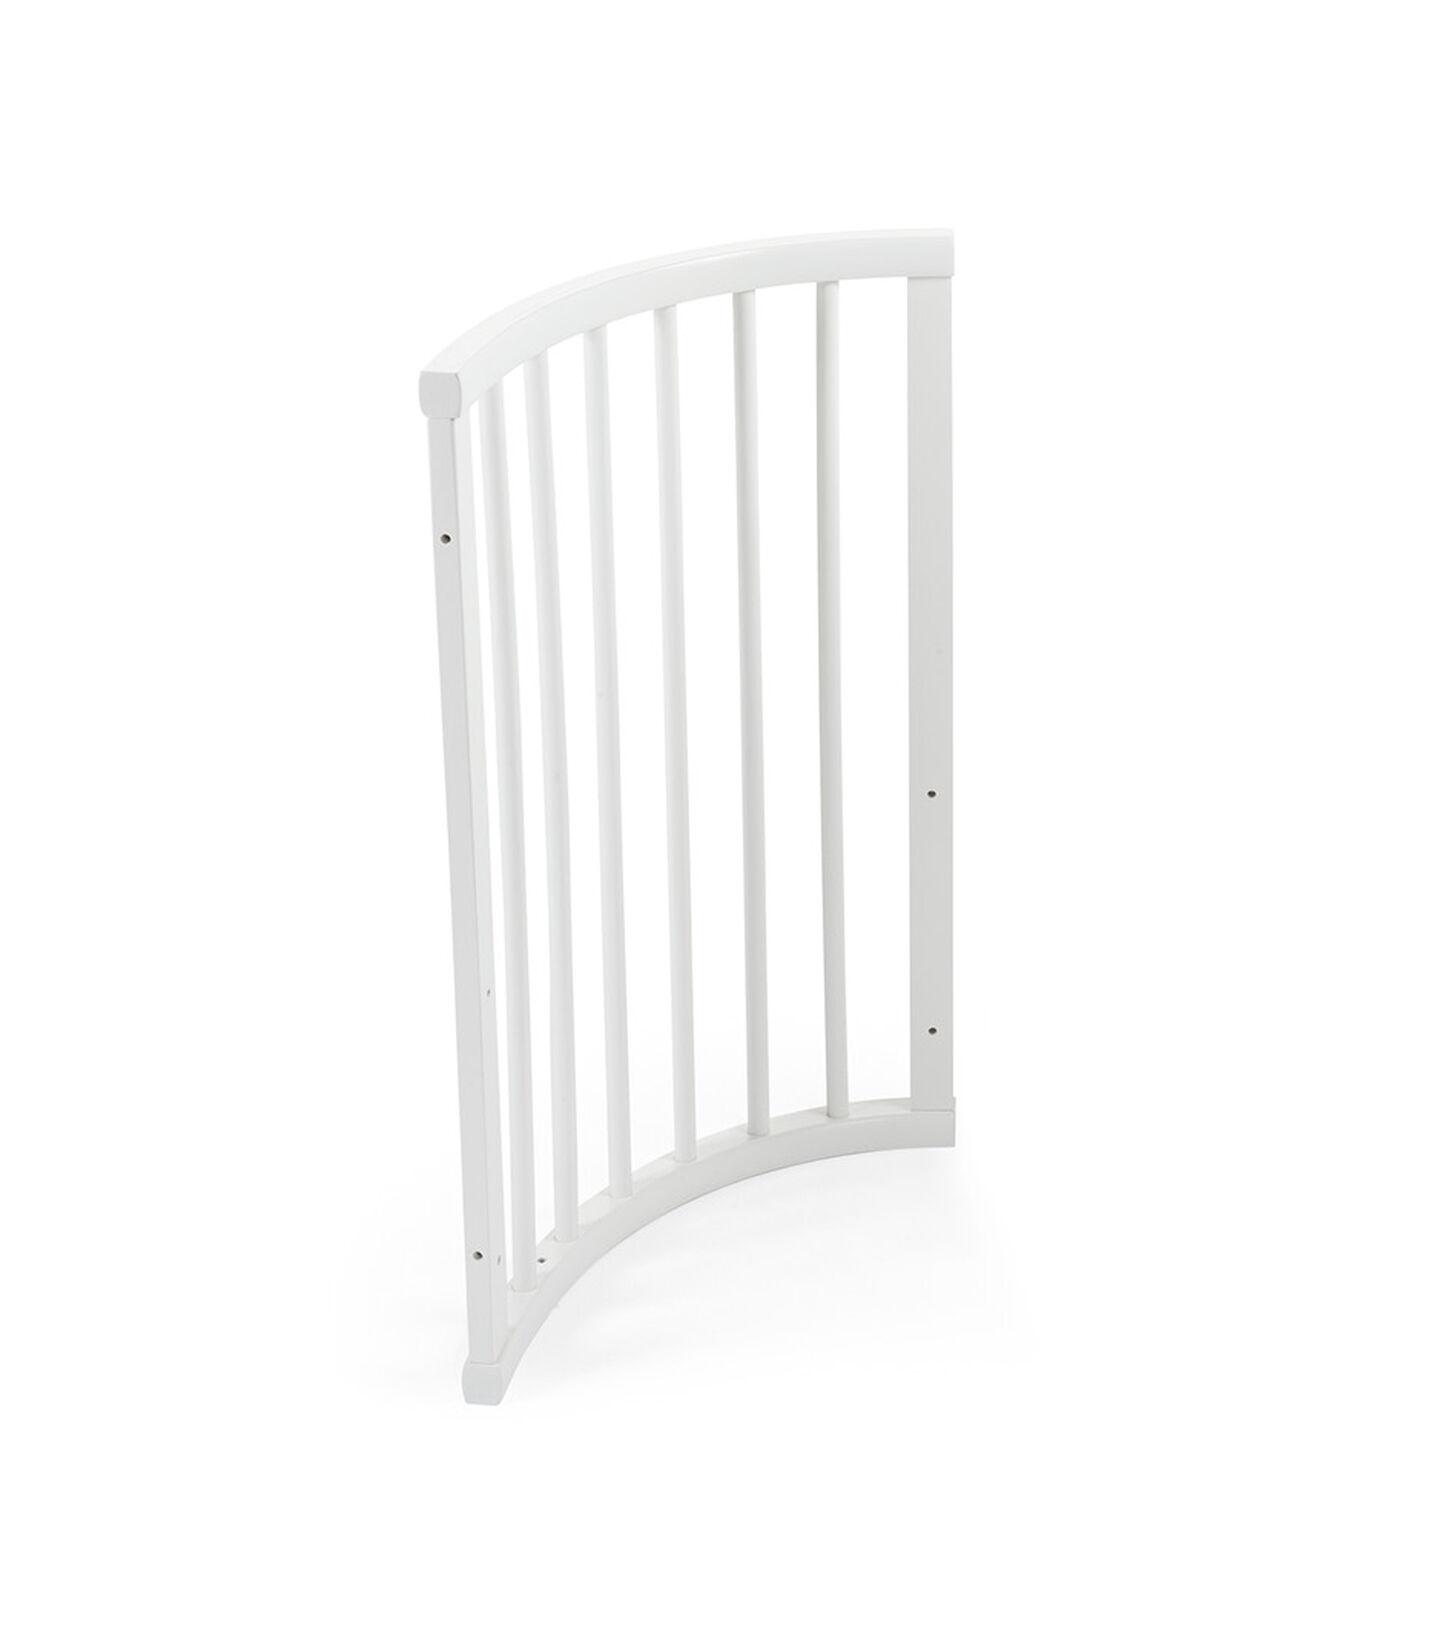 Stokke® Sleepi™ Branche Terminale Gauche Blanc, Blanc, mainview view 2